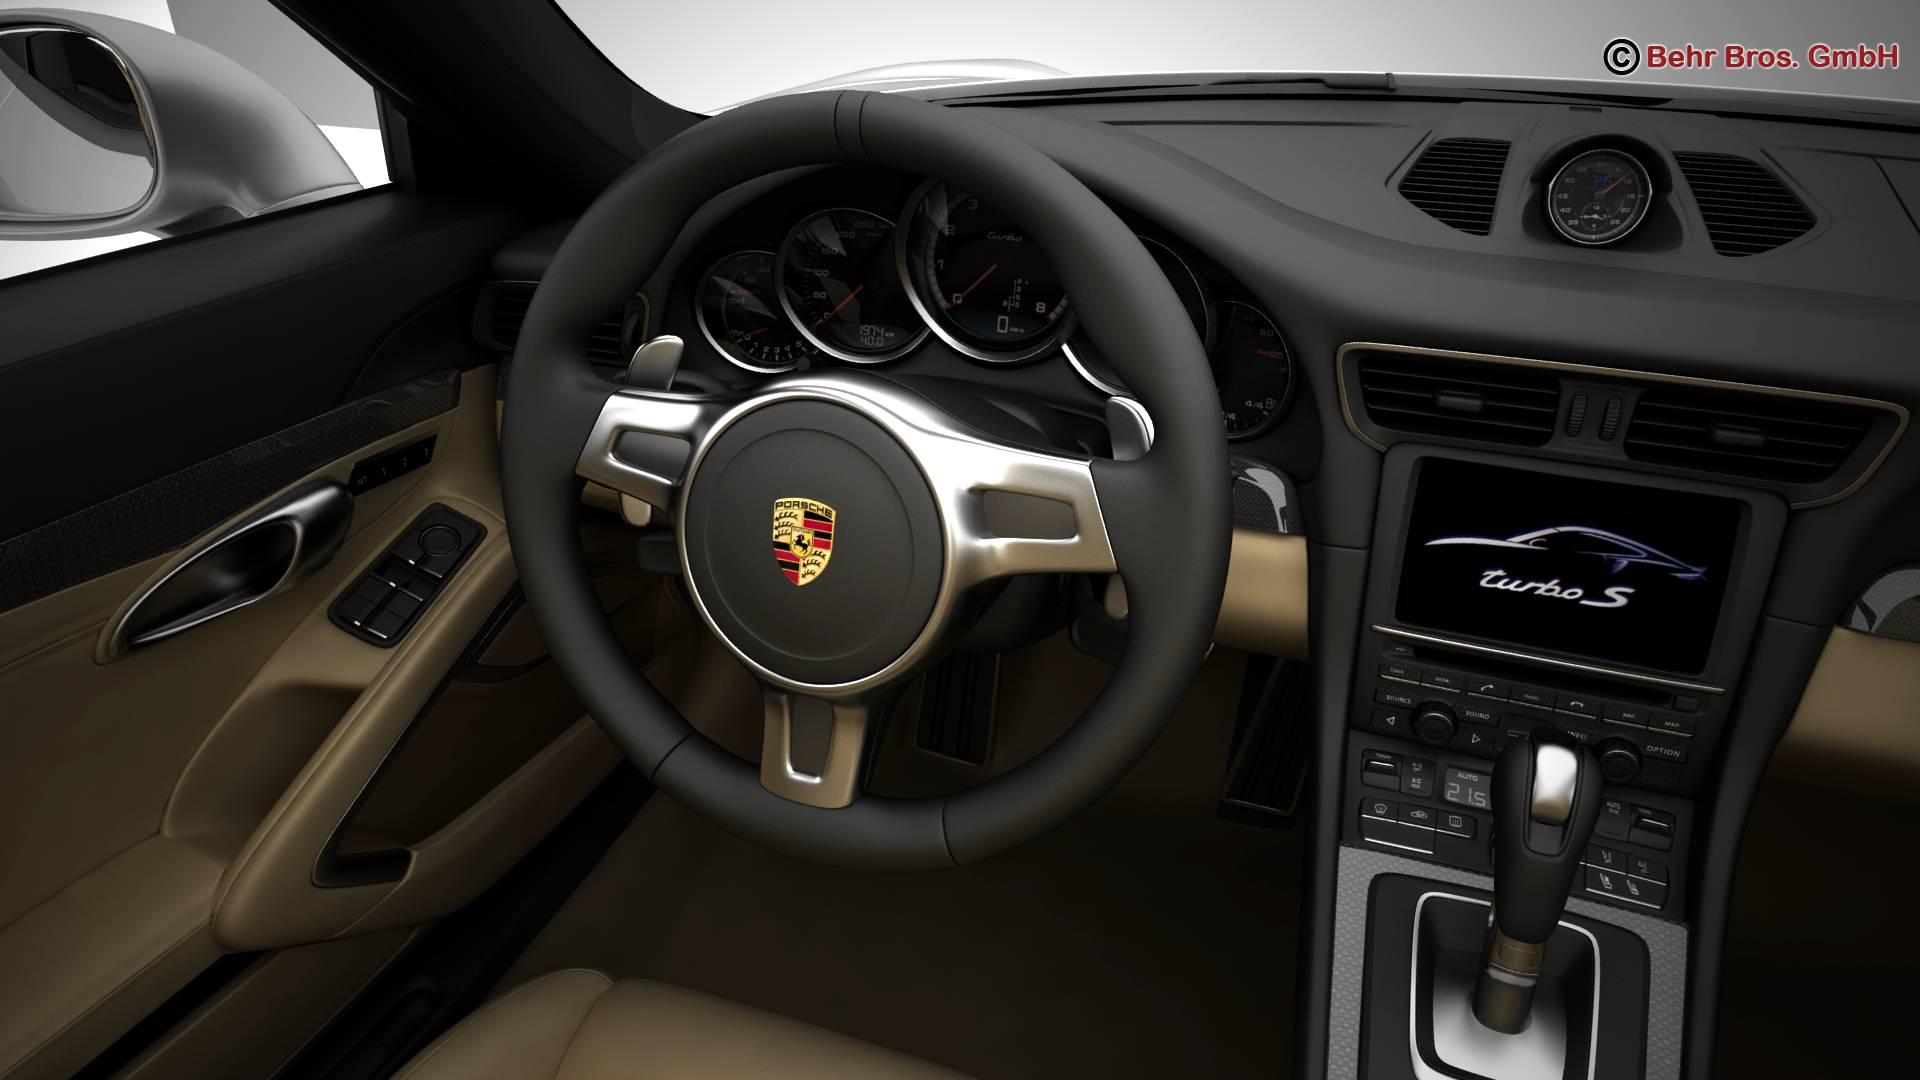 06 45 42 623 porsche 911 turbo s 2014 copyright 14 4